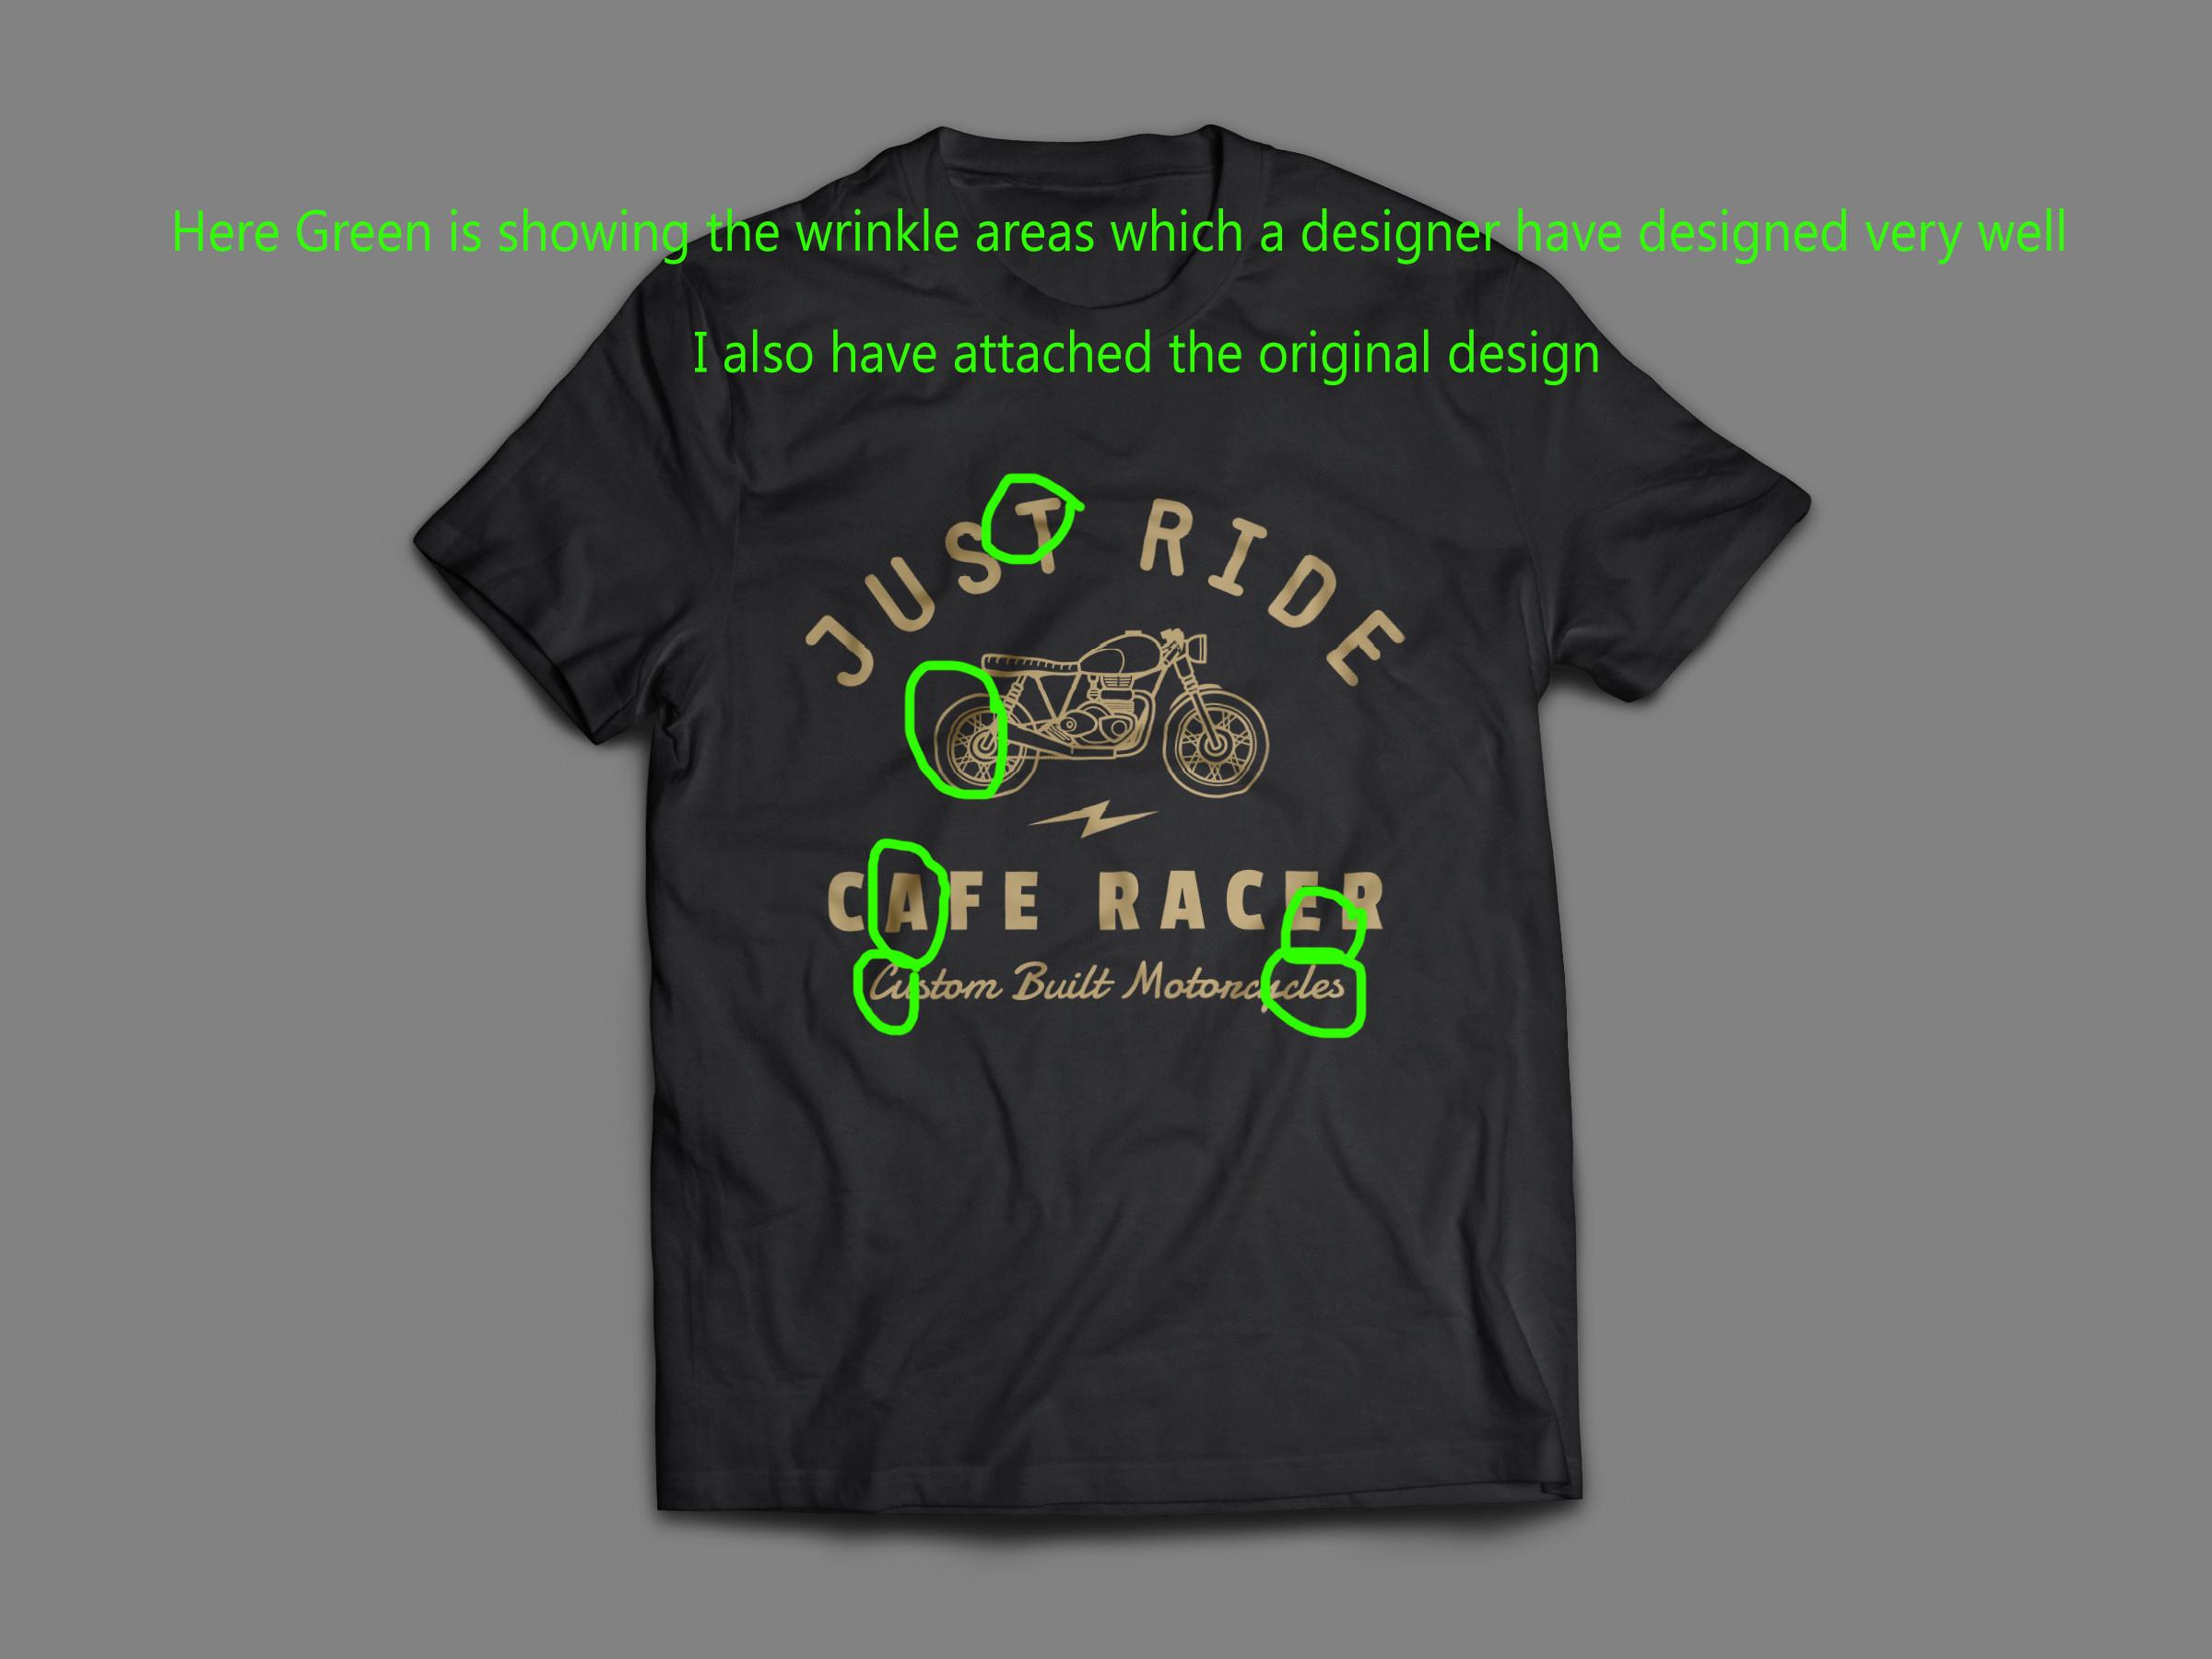 Design t shirt using photoshop - Design T Shirt On Photoshop To Design Downloaded Enter Image Description Here Download